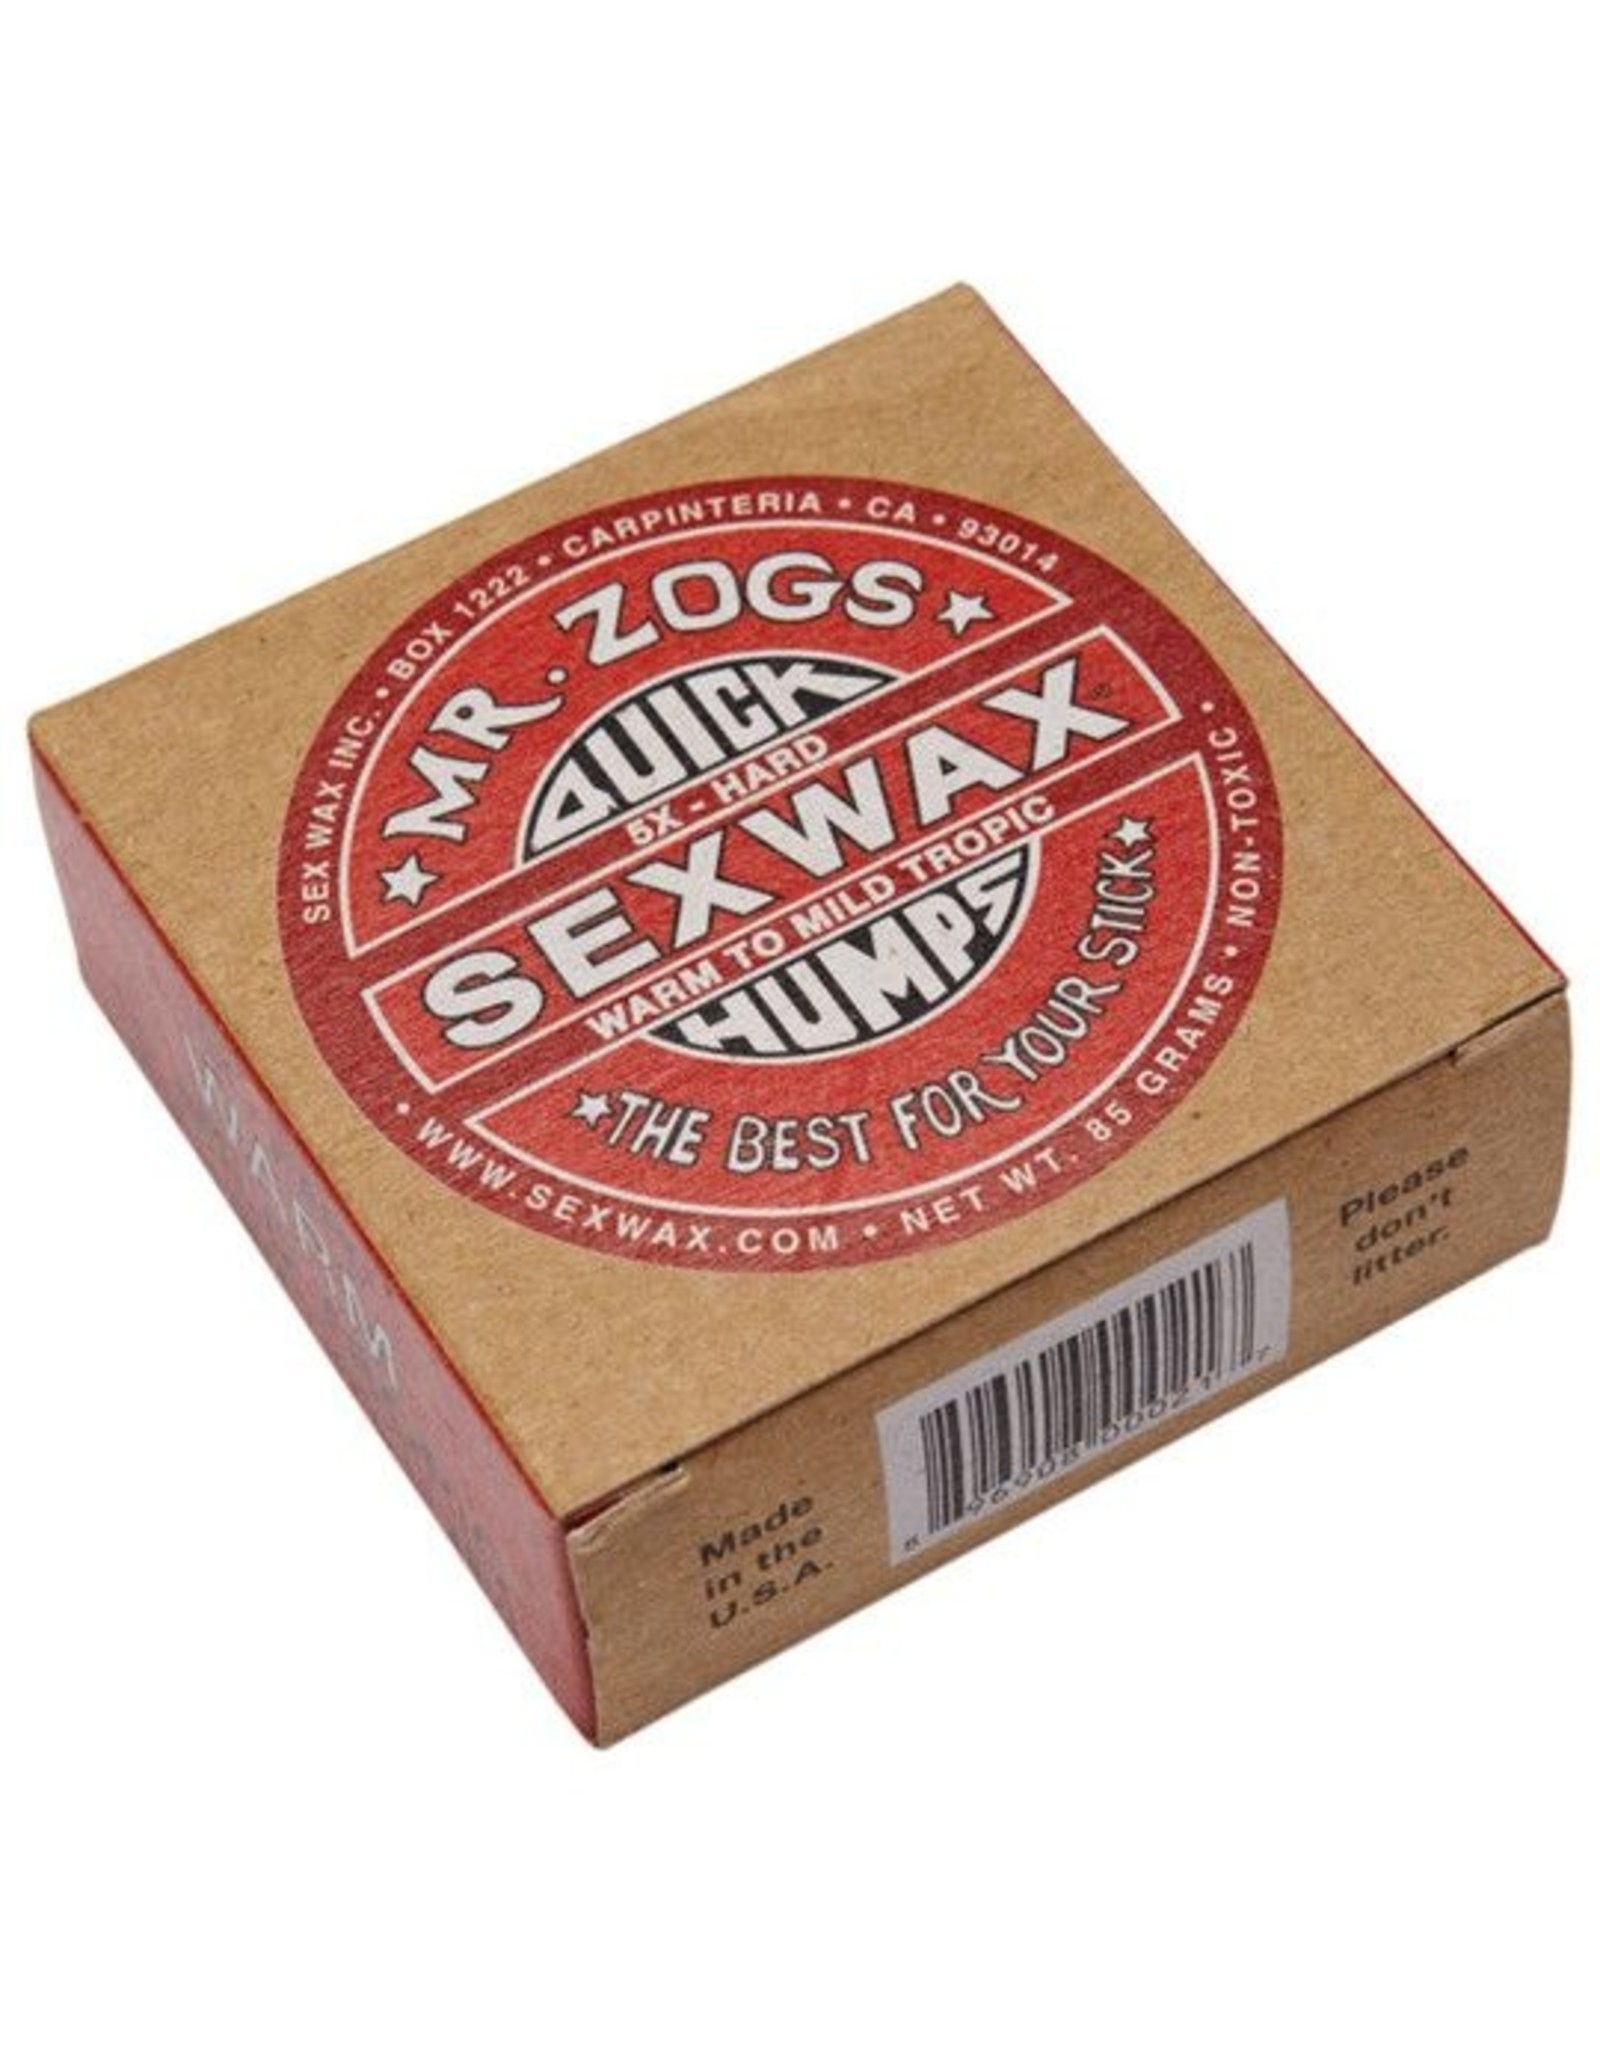 Mr. Zogs Mr, Zogs Sex Wax Red (Mild Tropic)